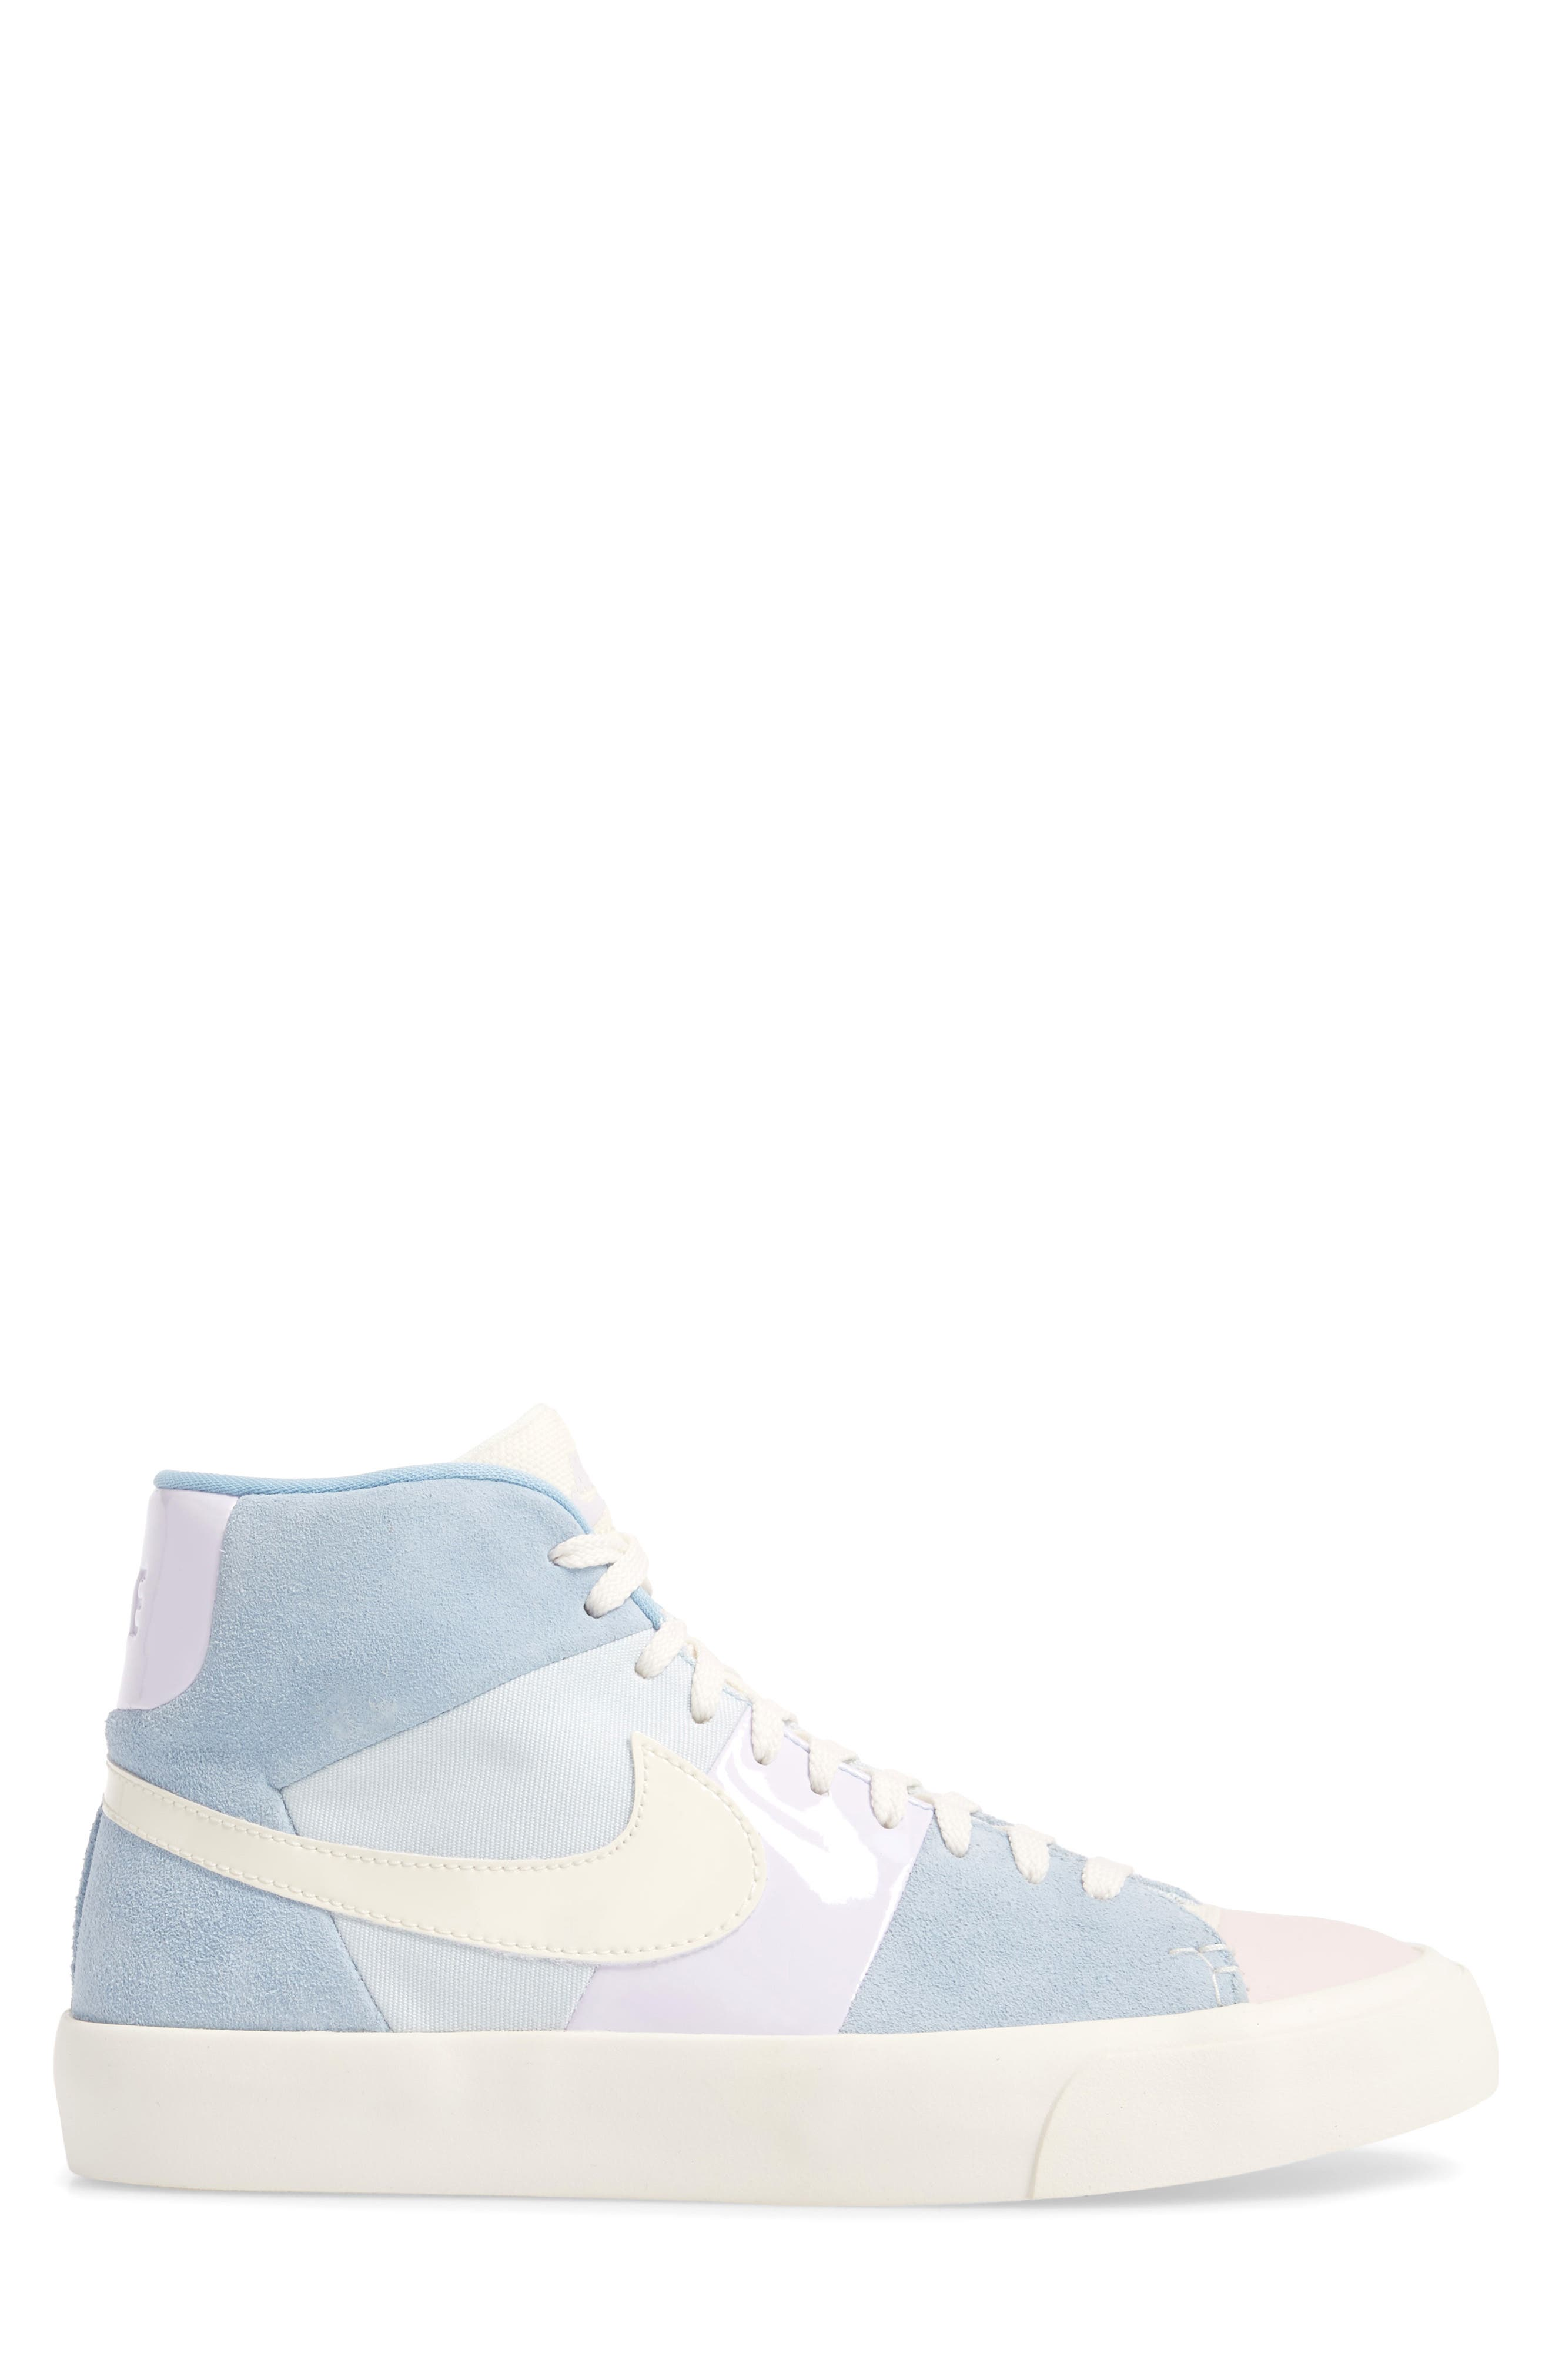 Blazer Royal Easter QS High Top Sneaker,                             Alternate thumbnail 3, color,                             650